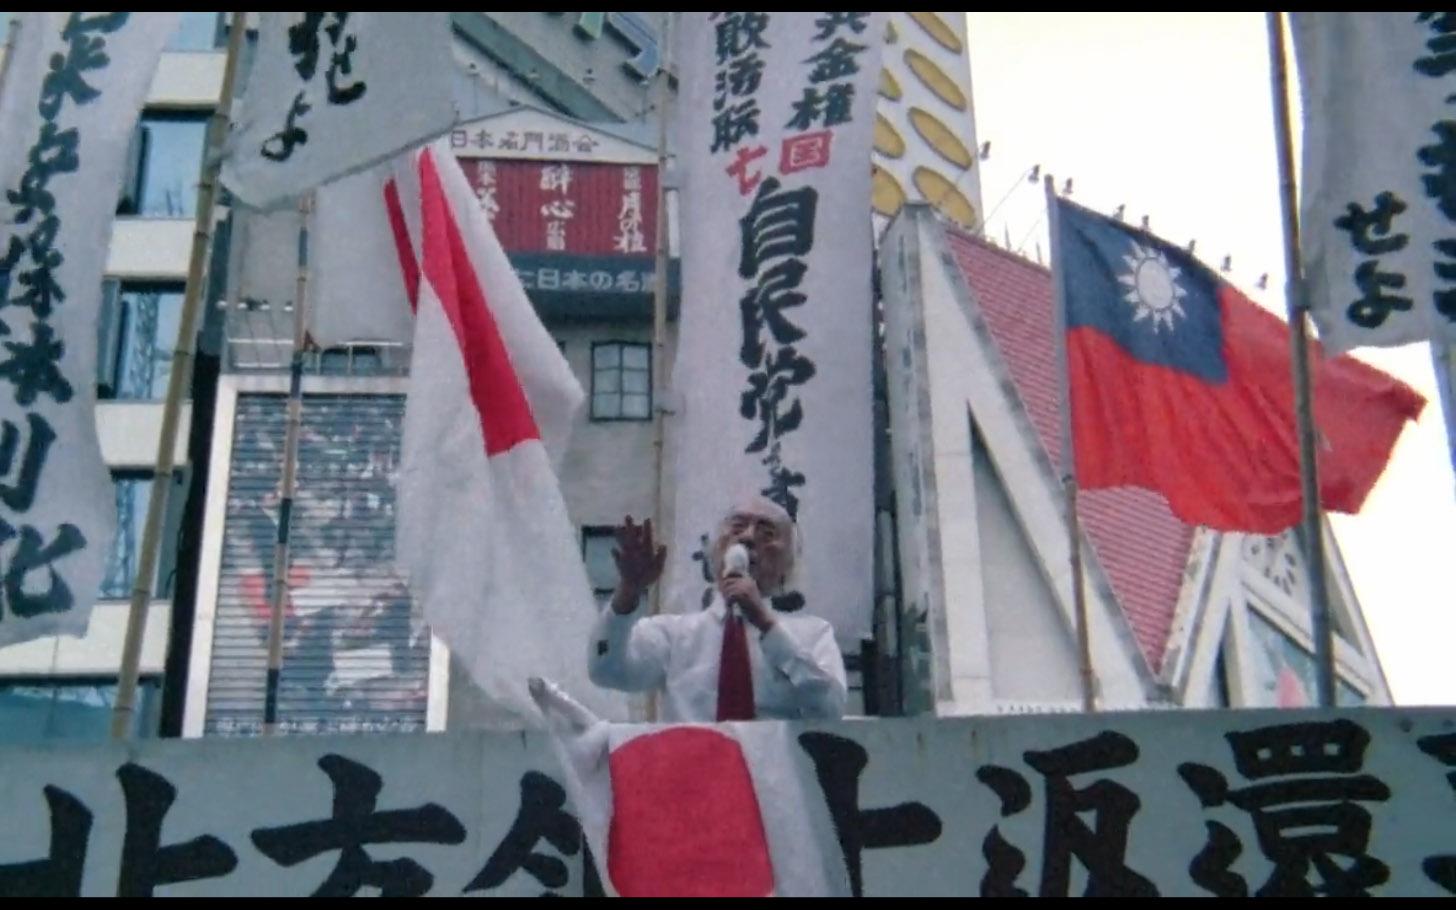 sans-soleil-1983-10.jpg